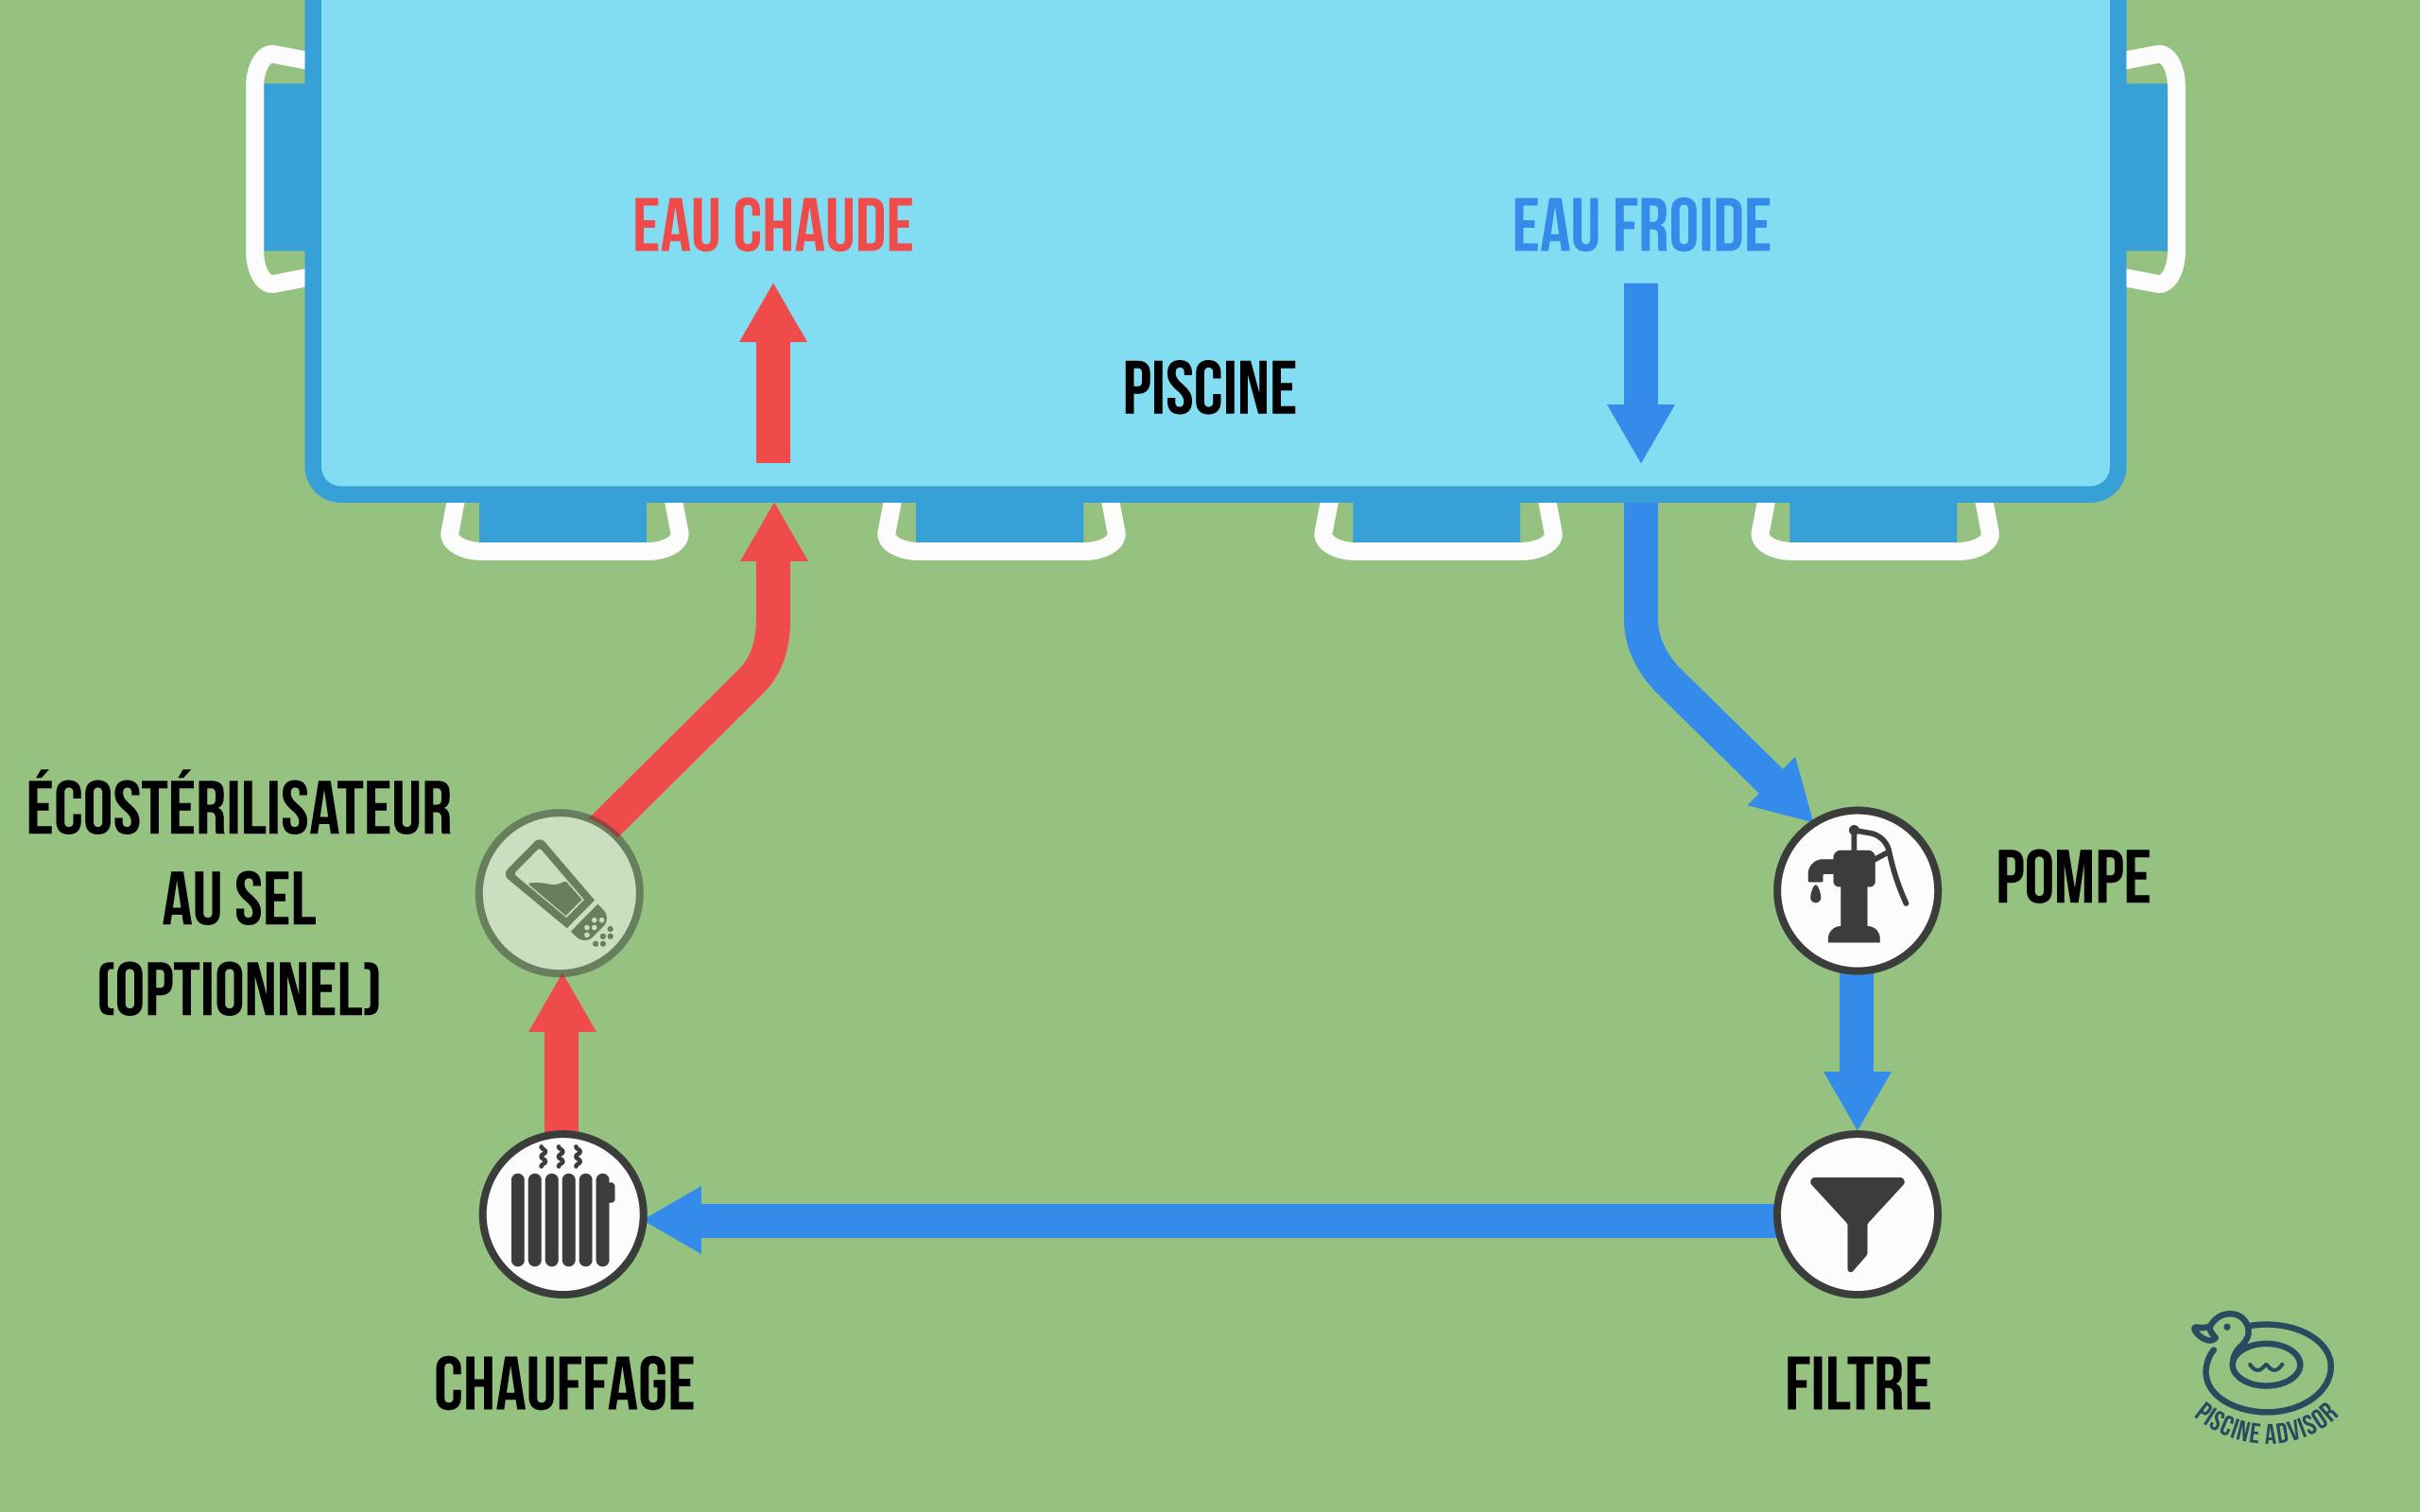 Chauffage Piscine Hors Sol : Toutes Les Solutions ... concernant Pompe Filtration Piscine Hors Sol Intex